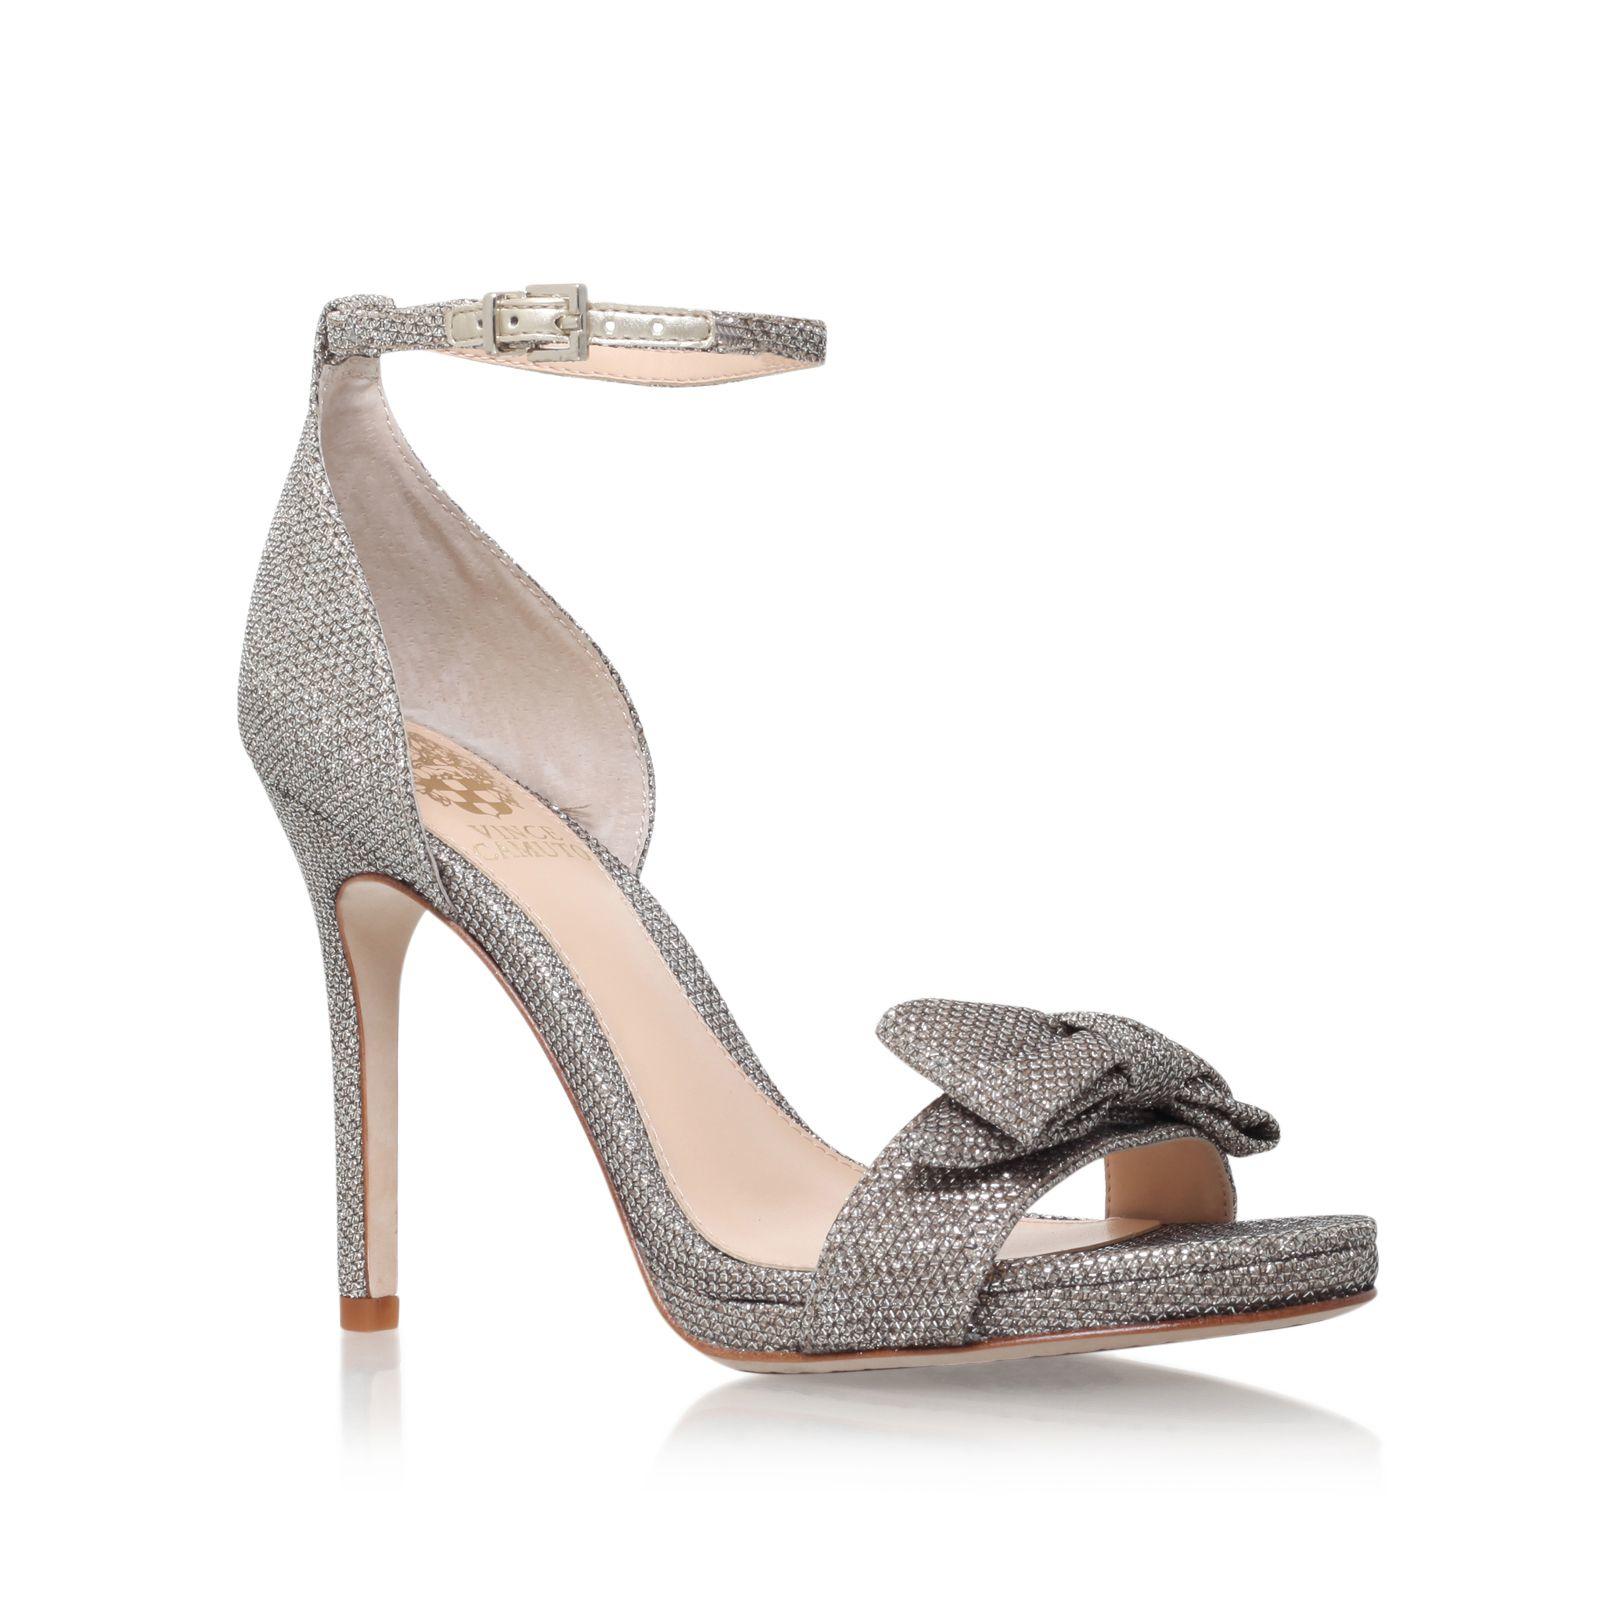 Vince Camuto Rizma High Heel Sandals In Metallic Lyst